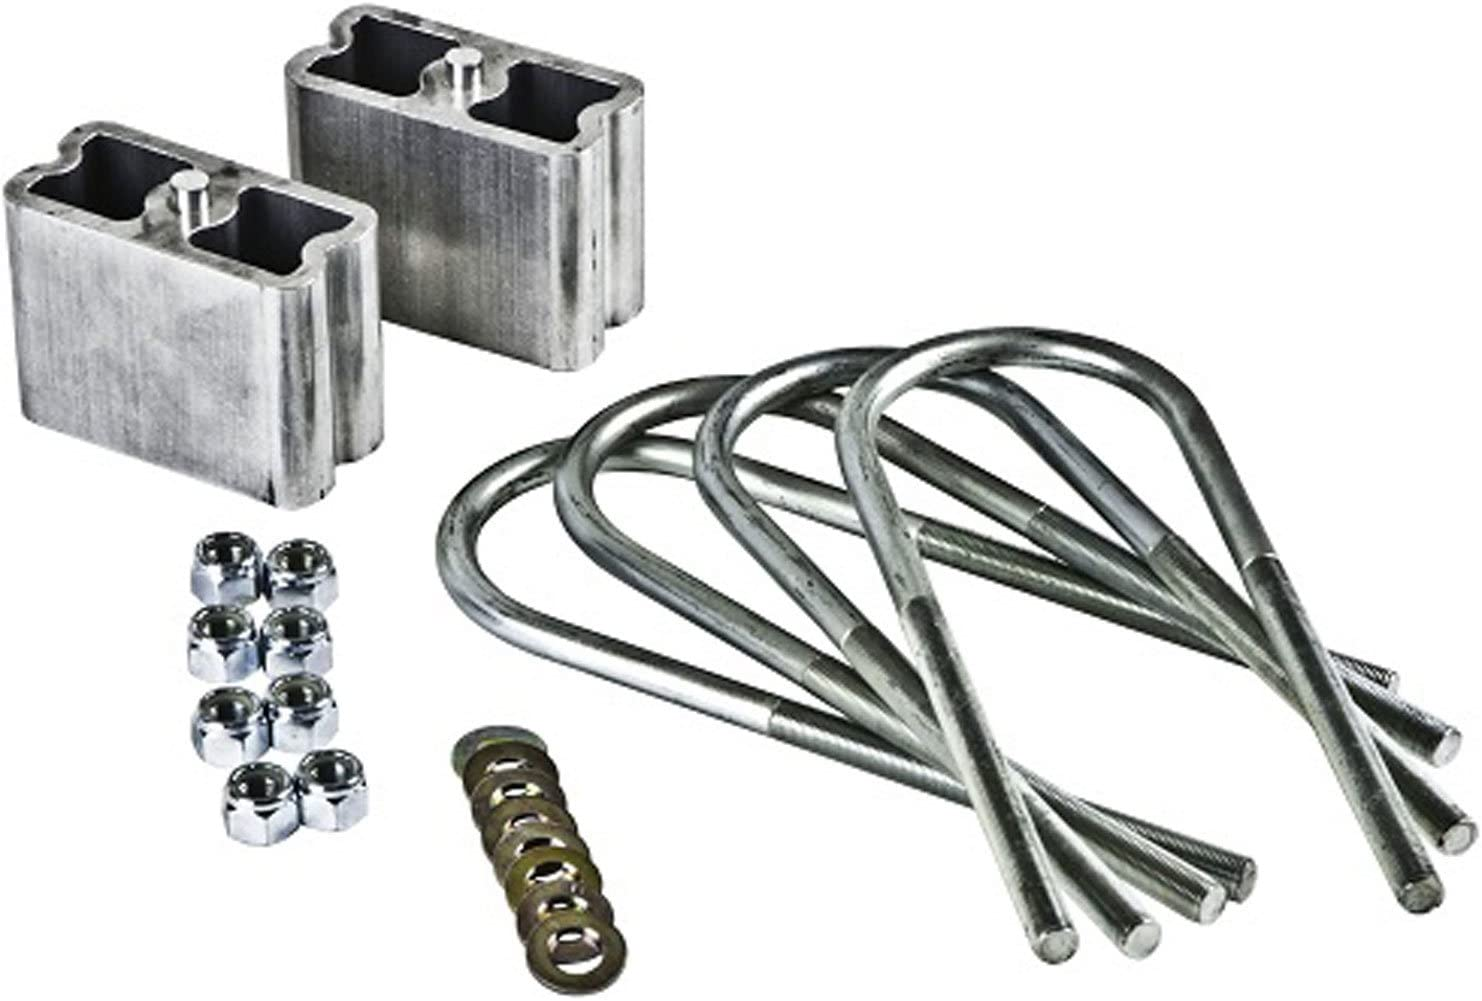 Belltech 6210 Lowering Block Kit